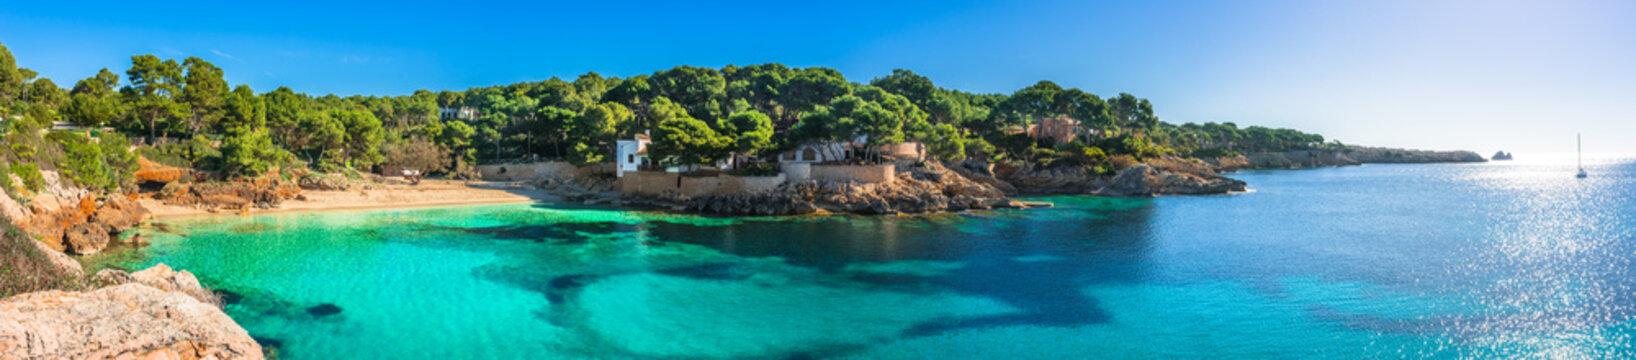 Beautiful panorama view of the beach and coast of Cala Gat in Cala Ratjada on Majorca Island, Spain Mediterranean Sea